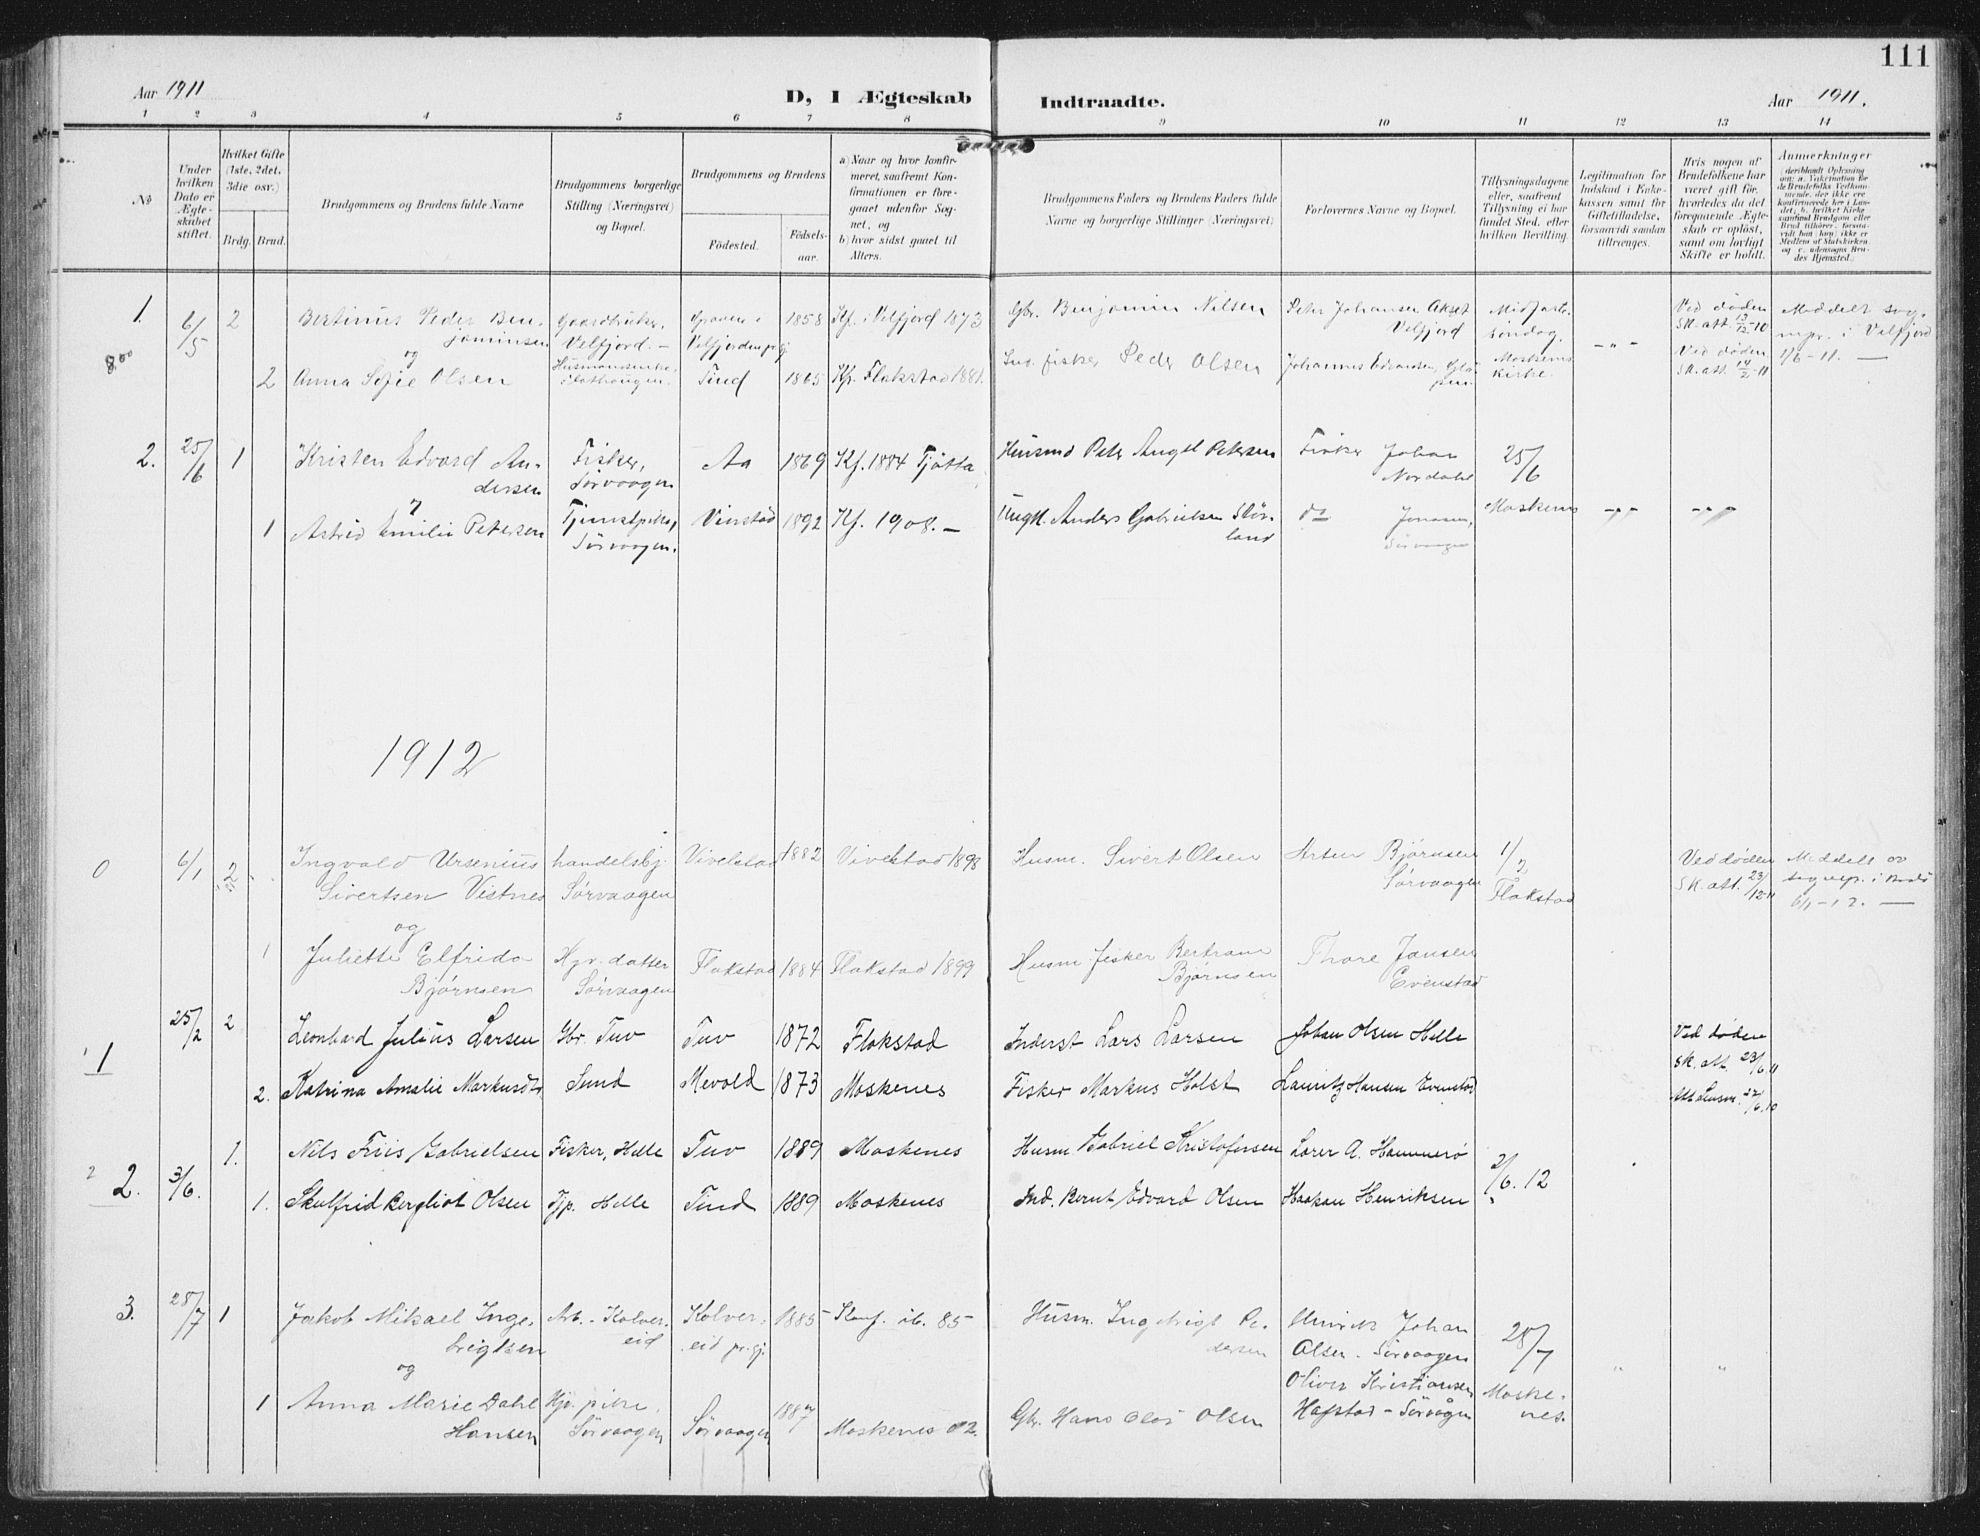 SAT, Ministerialprotokoller, klokkerbøker og fødselsregistre - Nordland, 886/L1221: Ministerialbok nr. 886A03, 1903-1913, s. 111